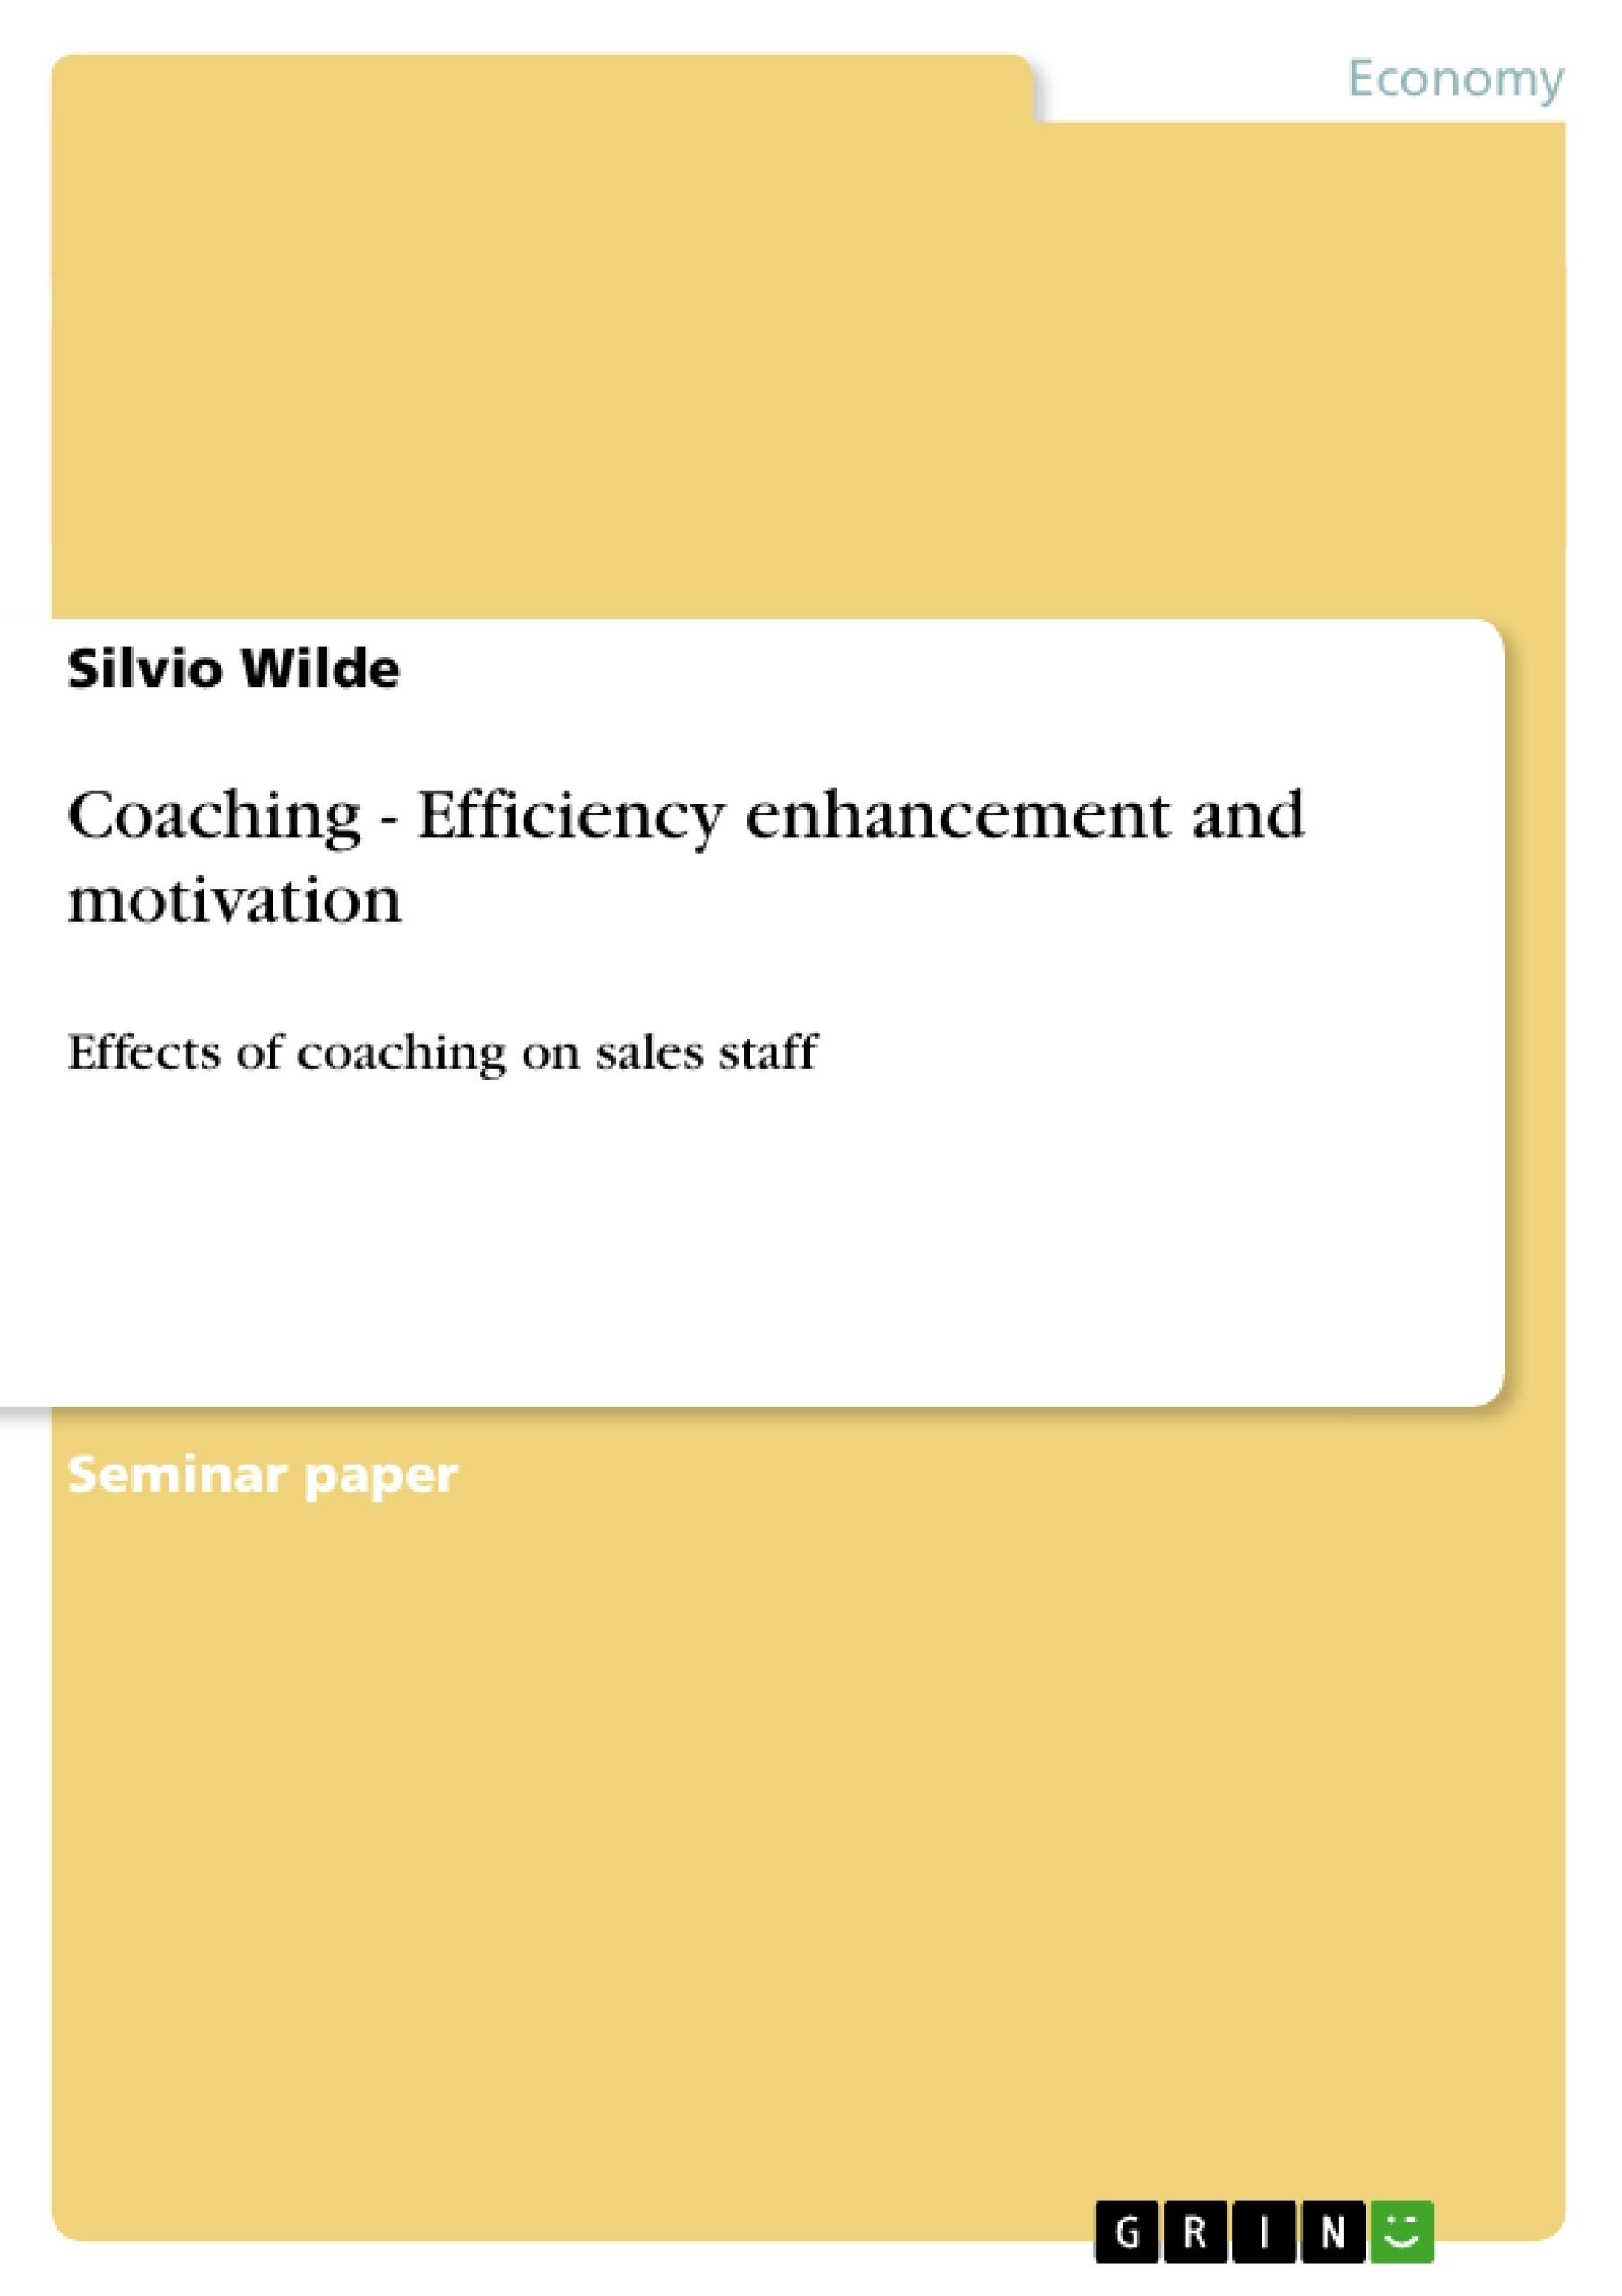 Title: Coaching - Efficiency enhancement and motivation